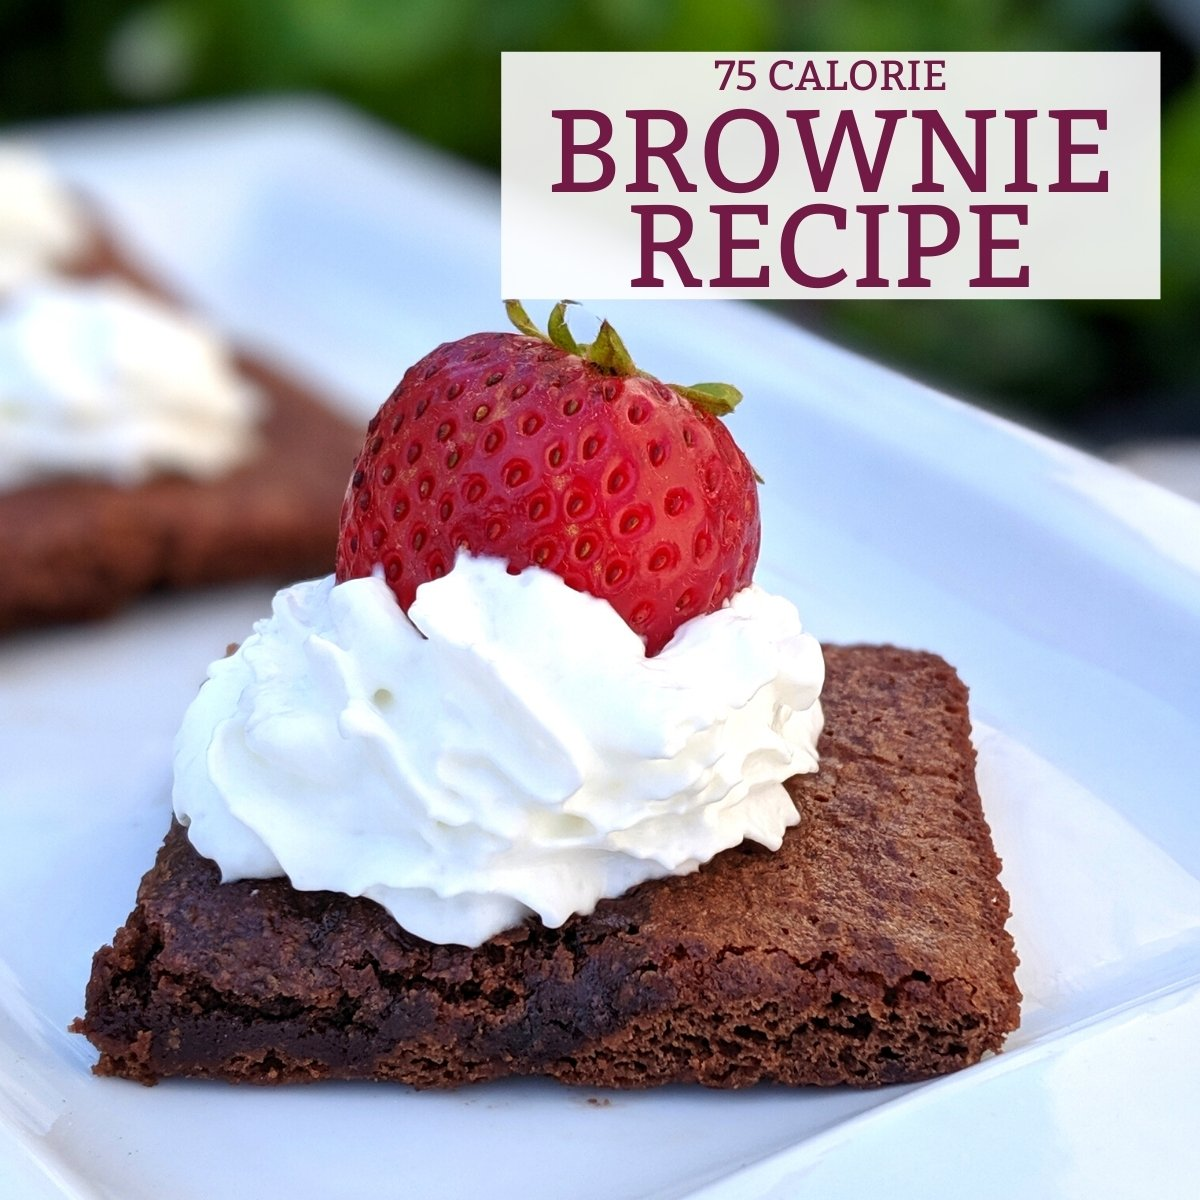 75 calorie brownie recipe thumbnail